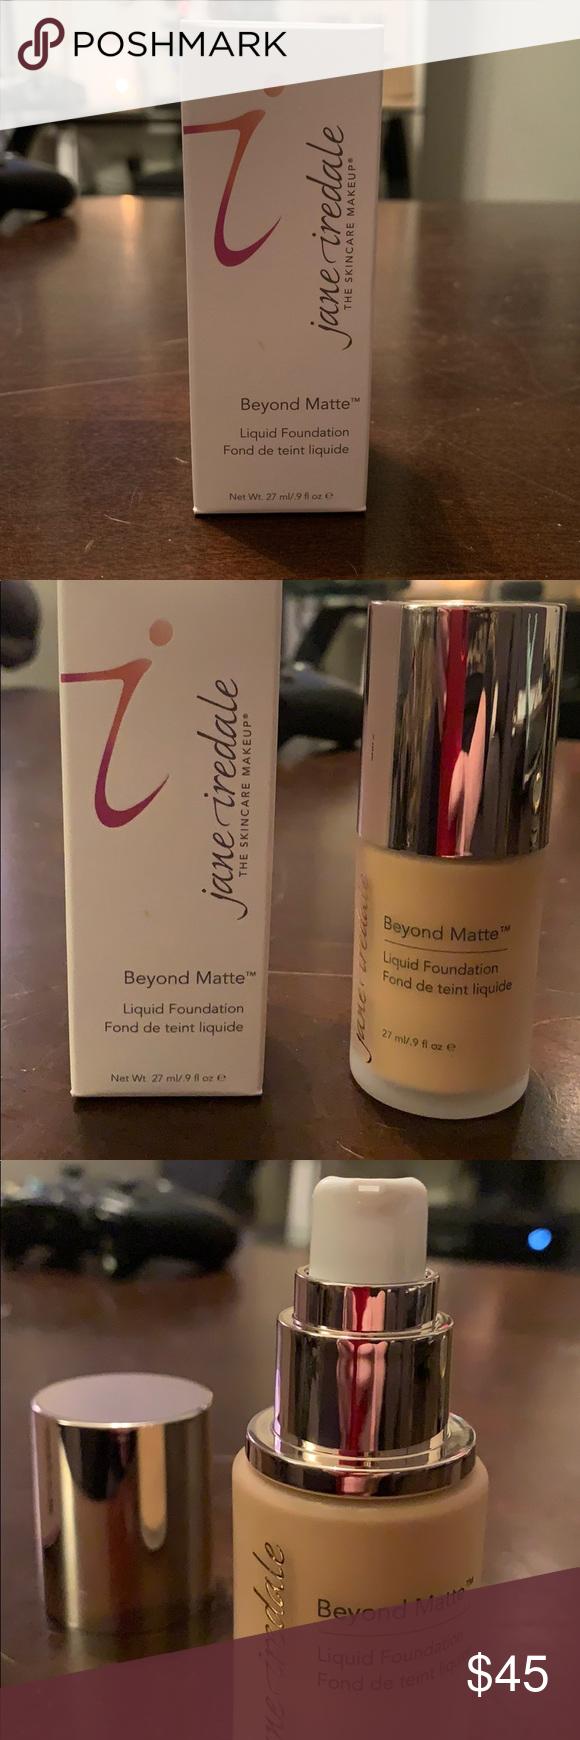 Jane Iredale Beyond Matte Liquid Foundation Liquid